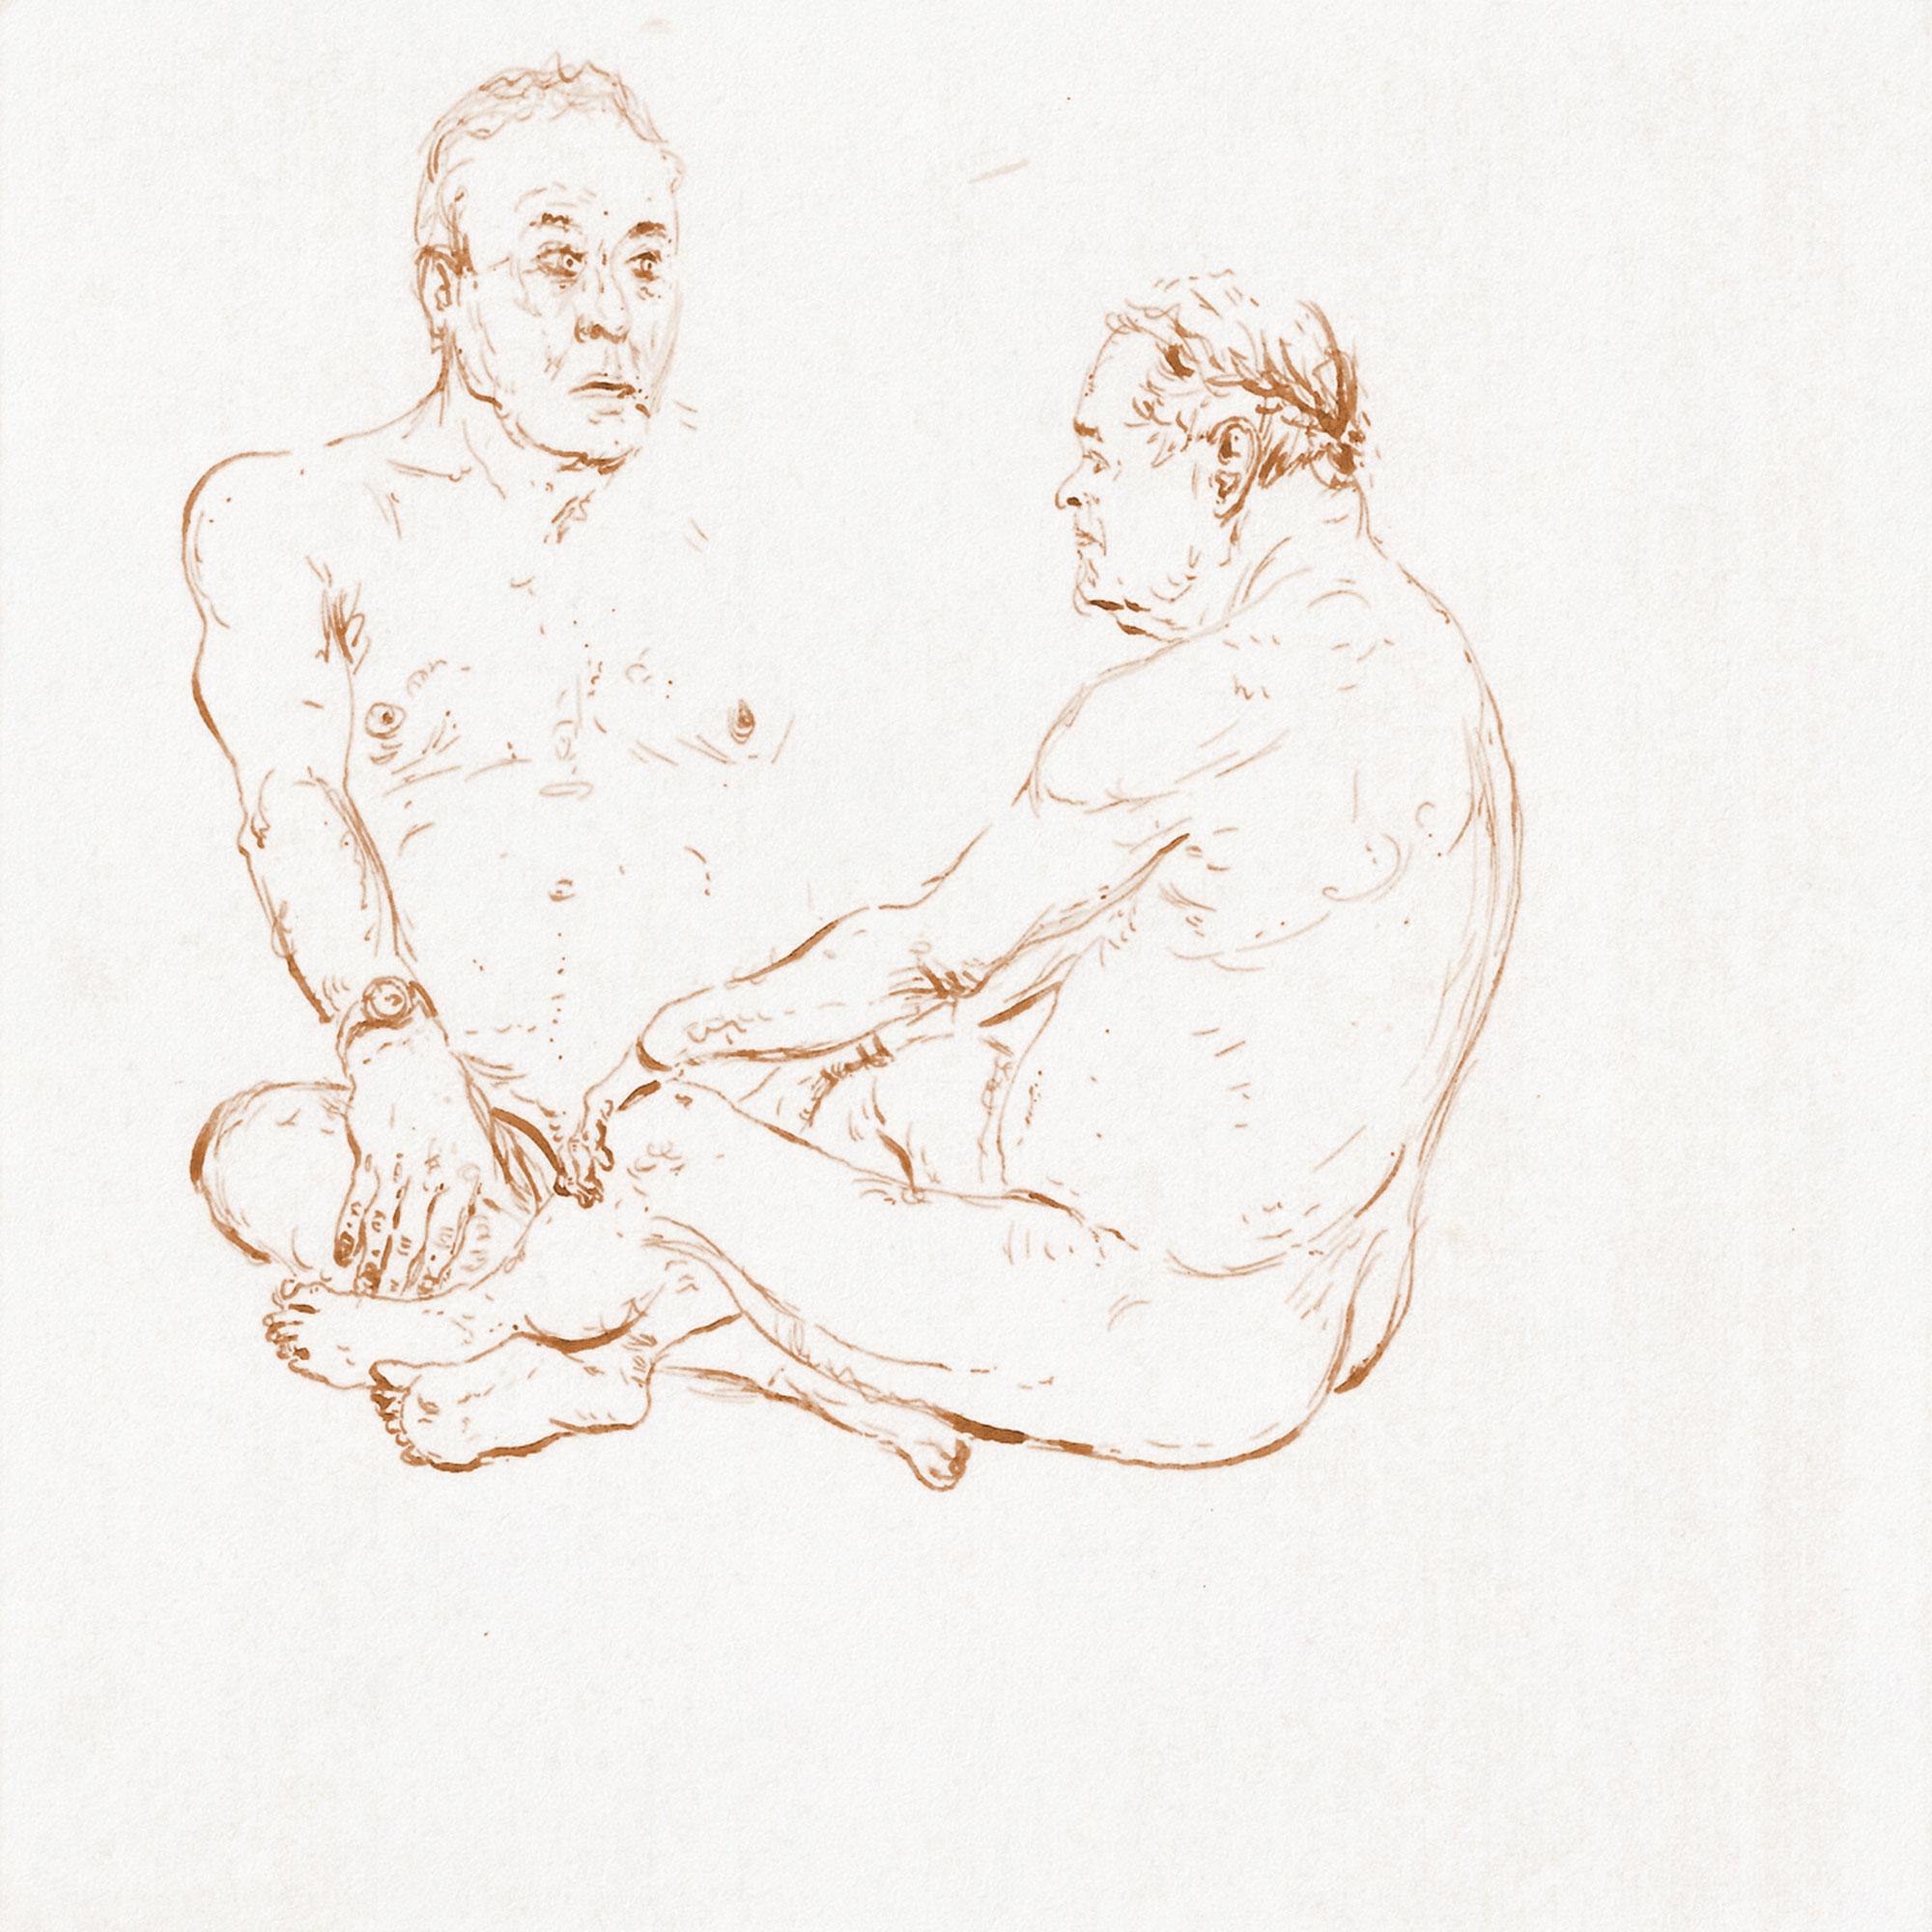 Man study Feb 15